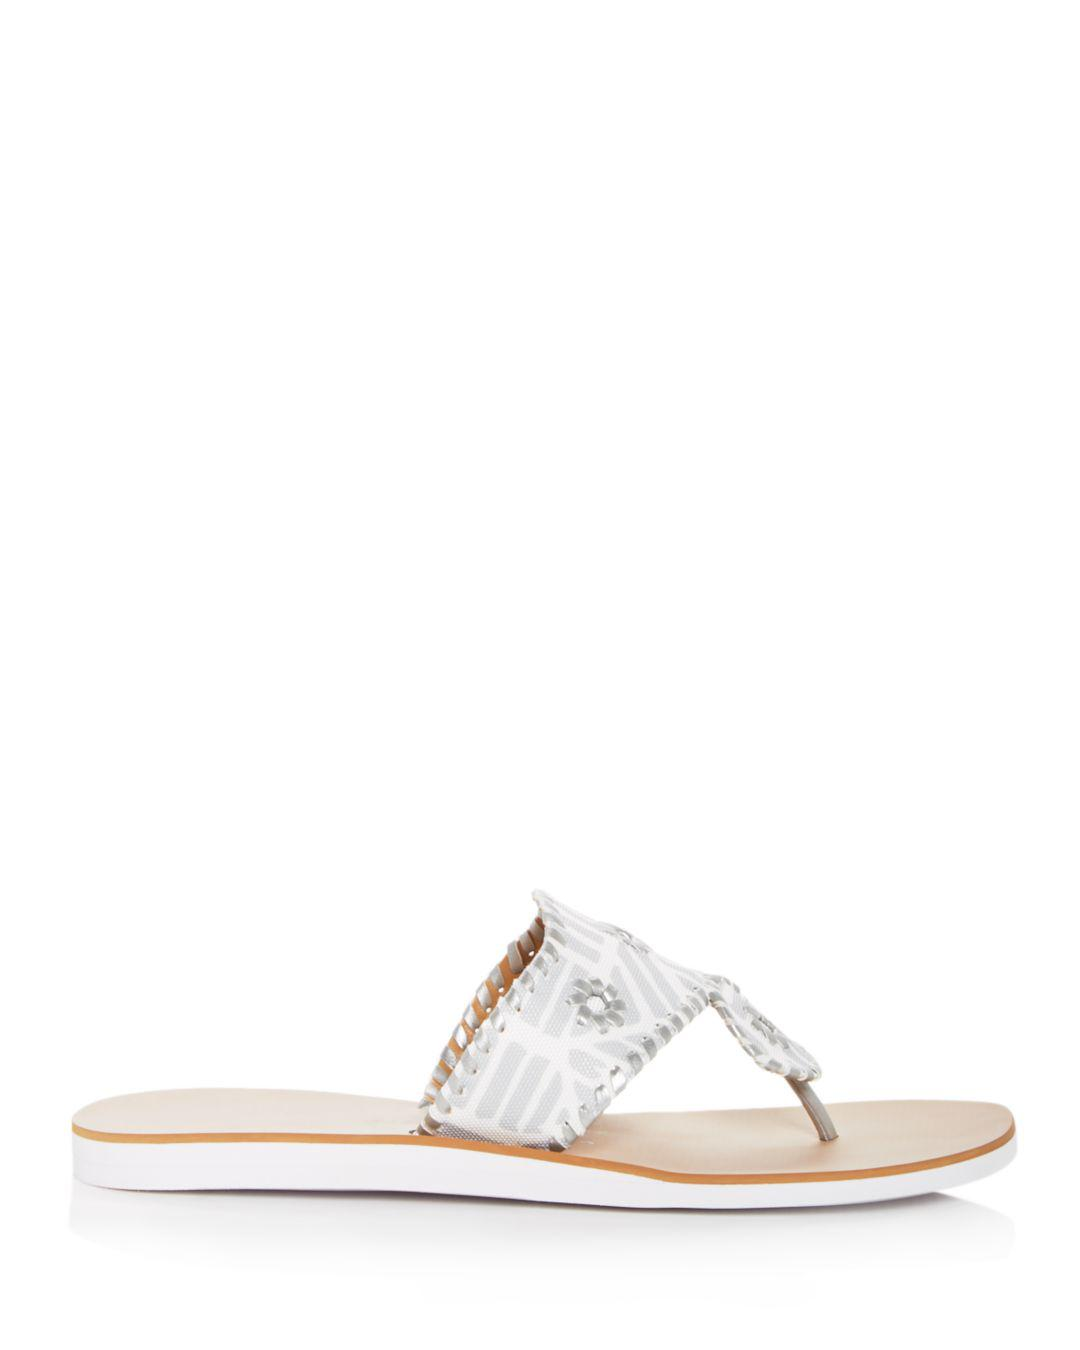 98d495f4c97 Lyst - Jack Rogers Women s Captiva Demi Wedge Thong Sandals in Metallic